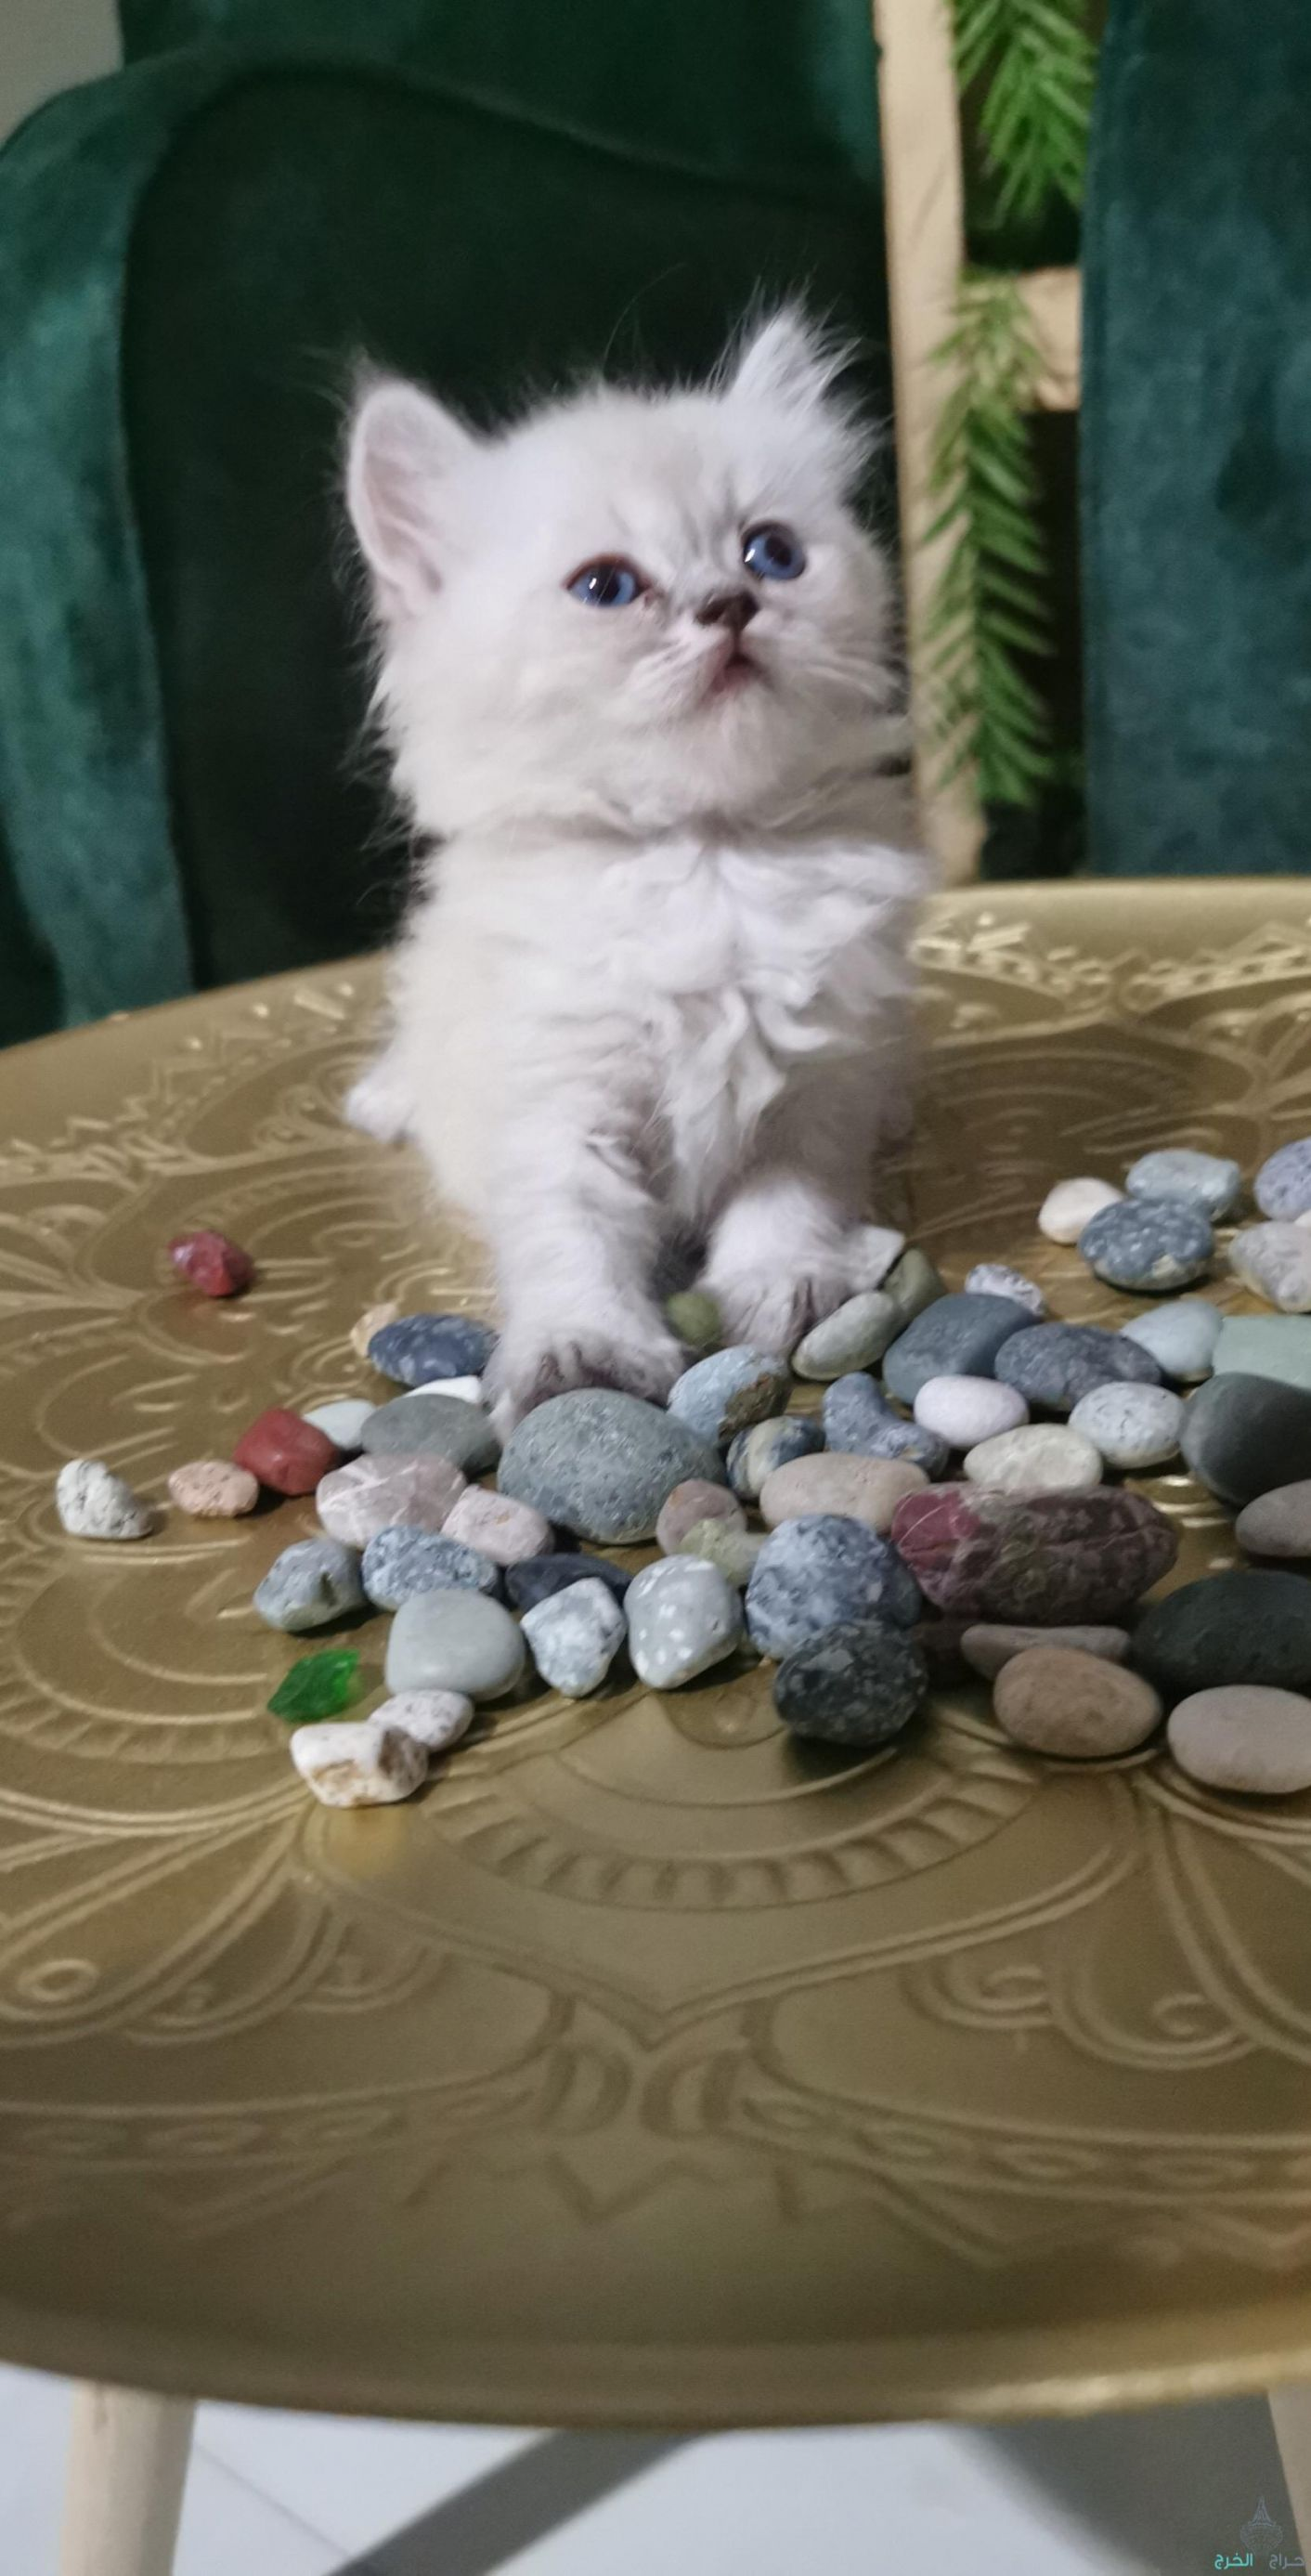 قطه أنثى هملايا صغيره